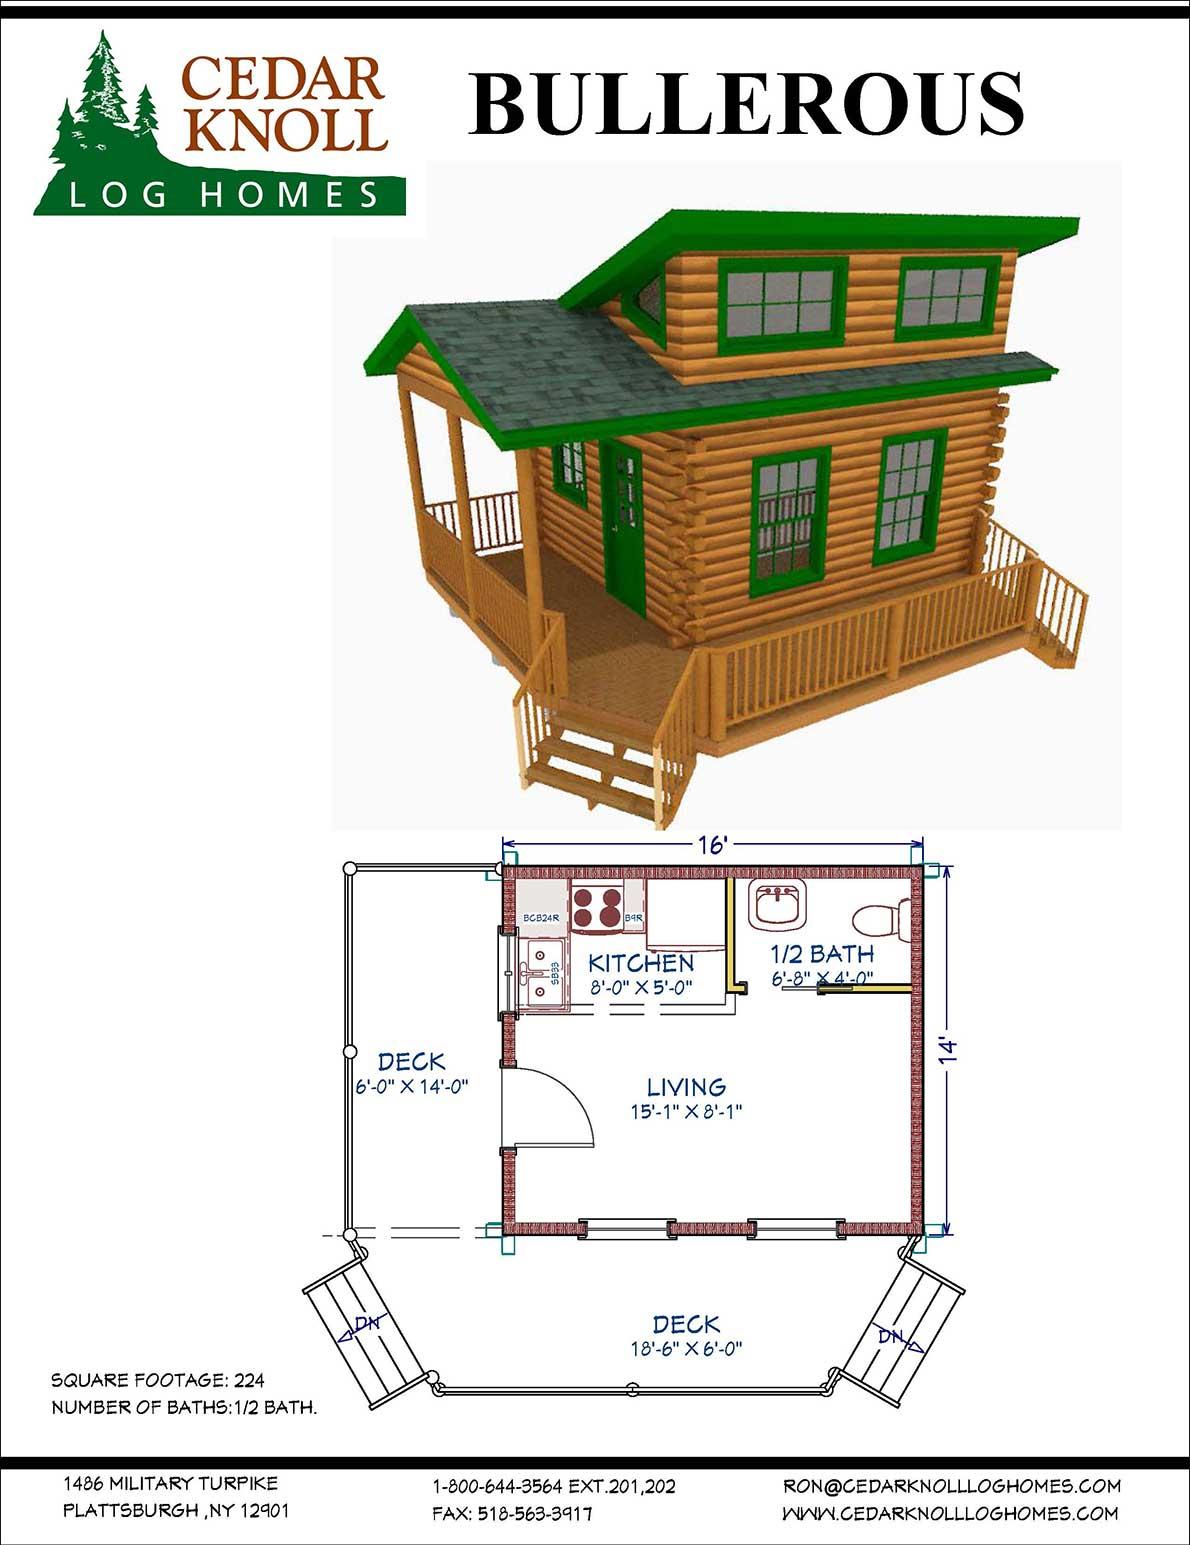 Bullerous Log Camp or Home Kit